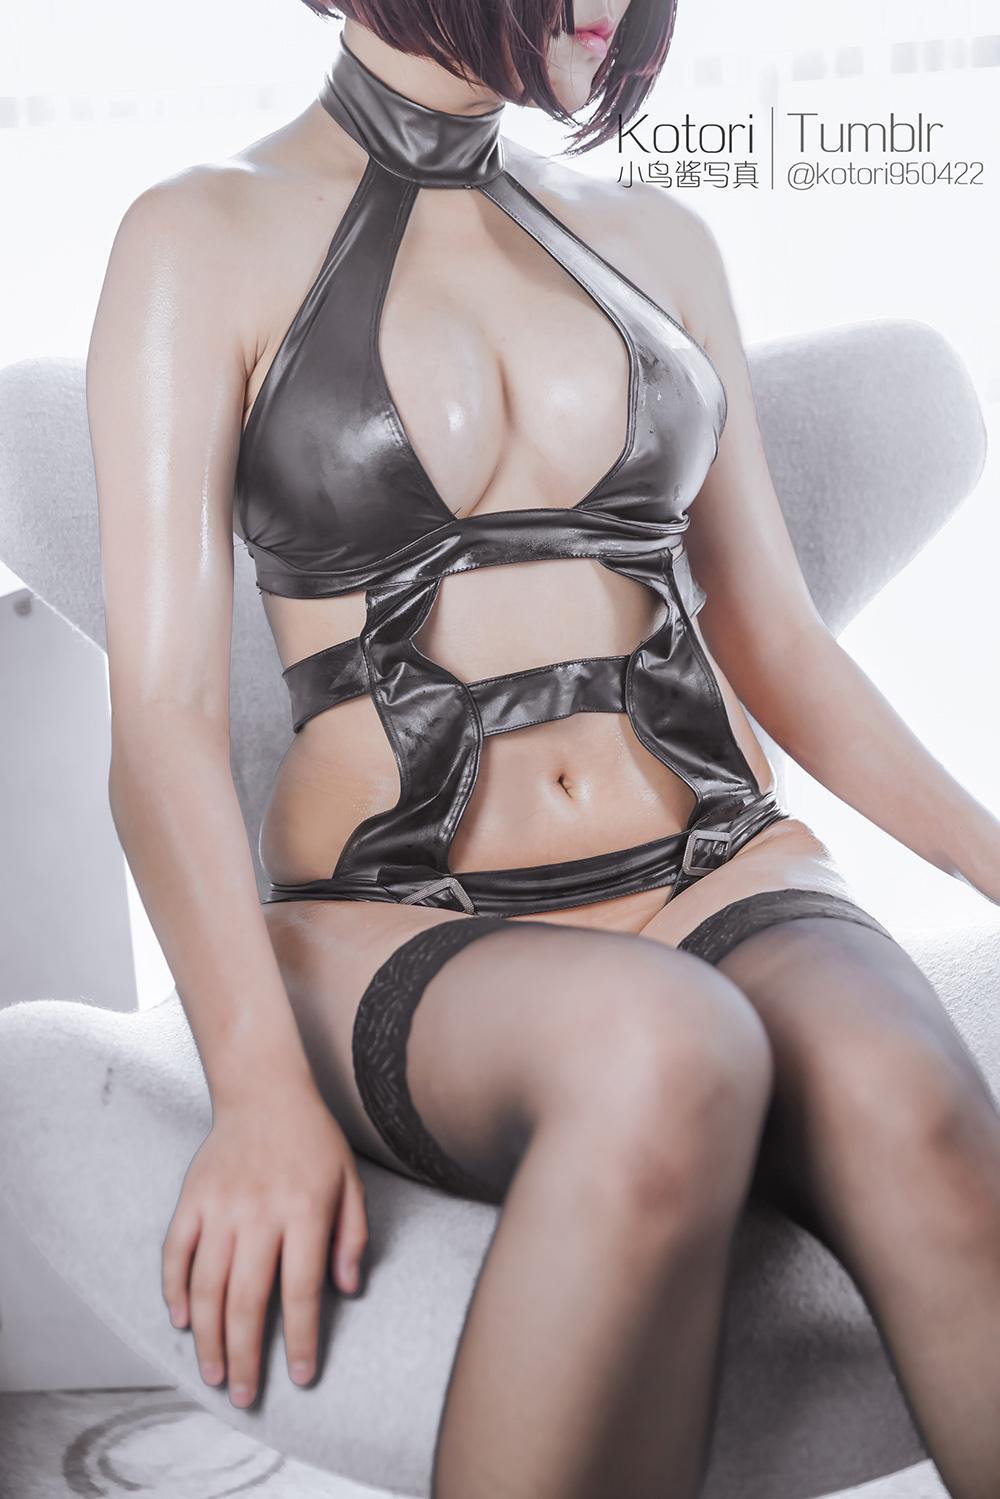 JACLUc - Cosplay girl PR社 福利姬 小鸟酱系列–黑色束缚衣